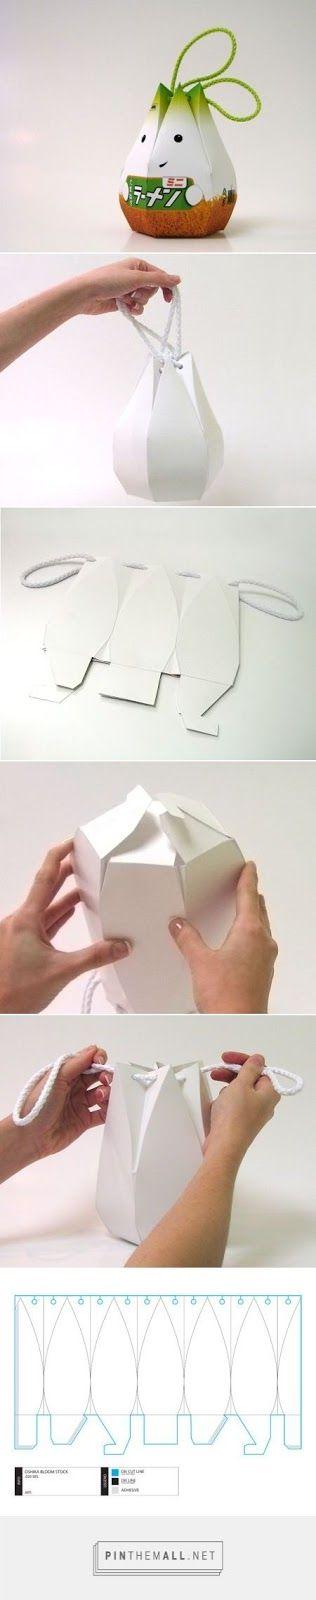 decorative packaging DIY, opakowania ozdobne tutoriale